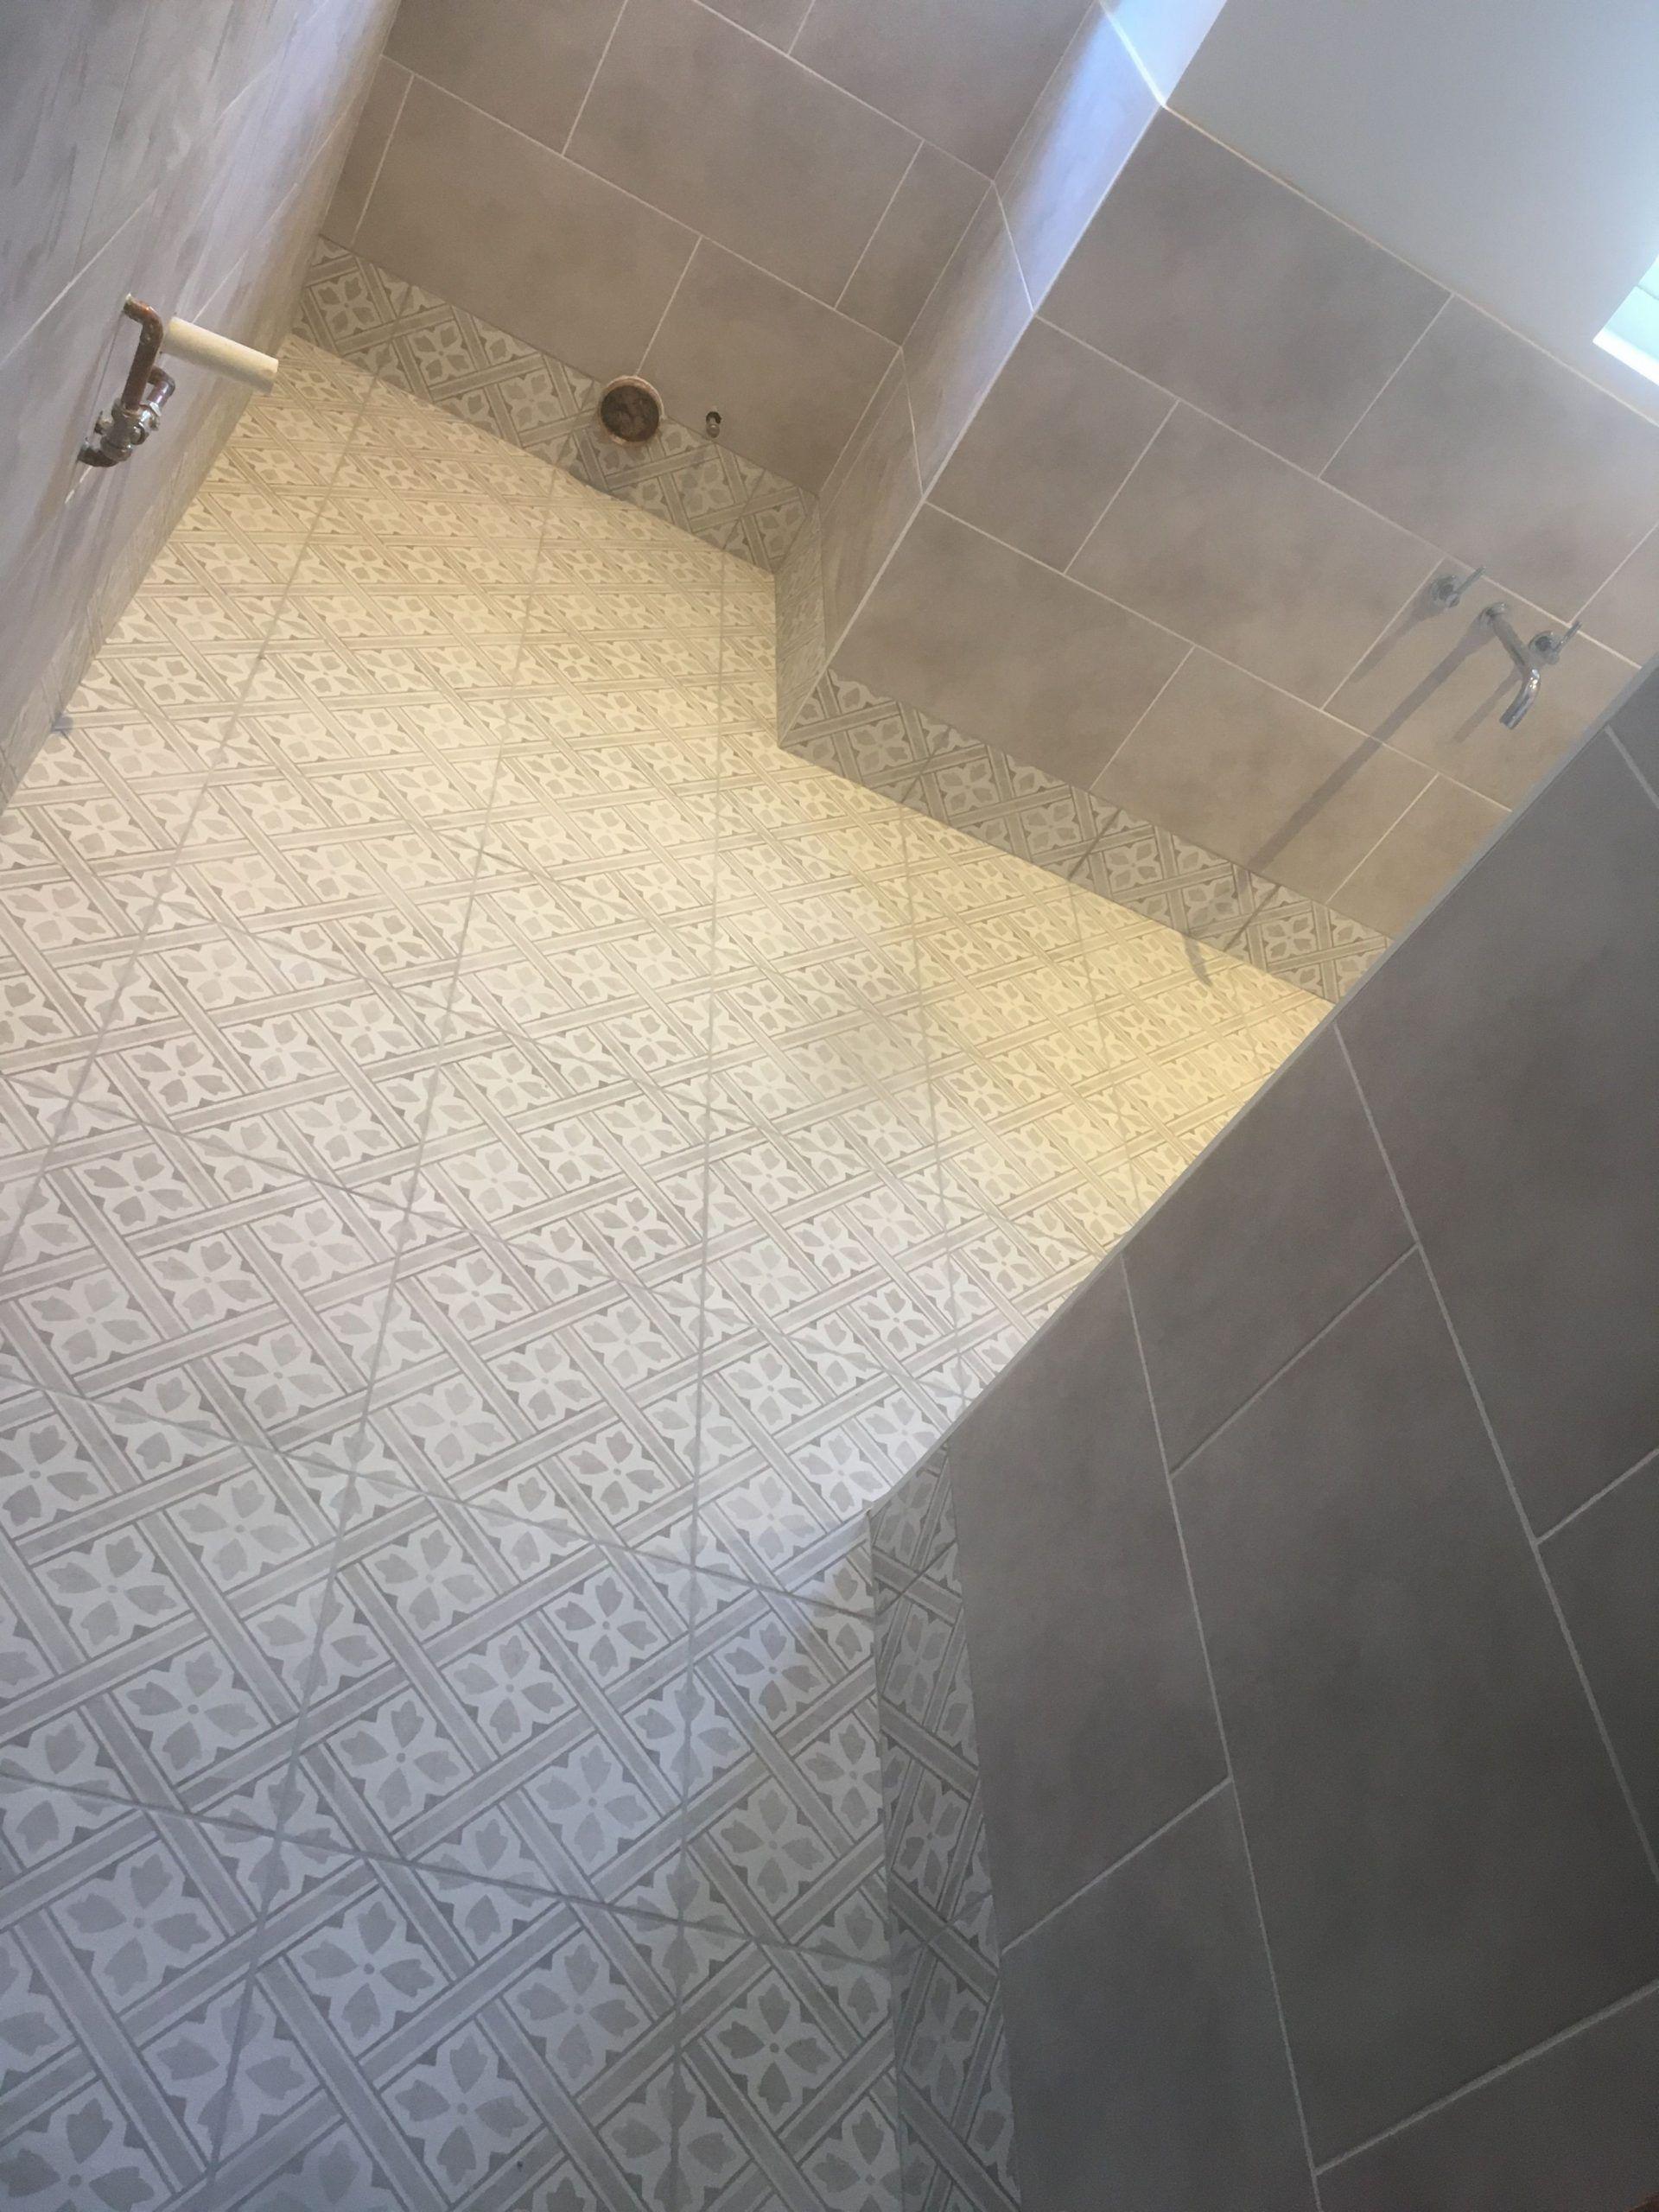 Laura Ashley Bathroom Tiles In 2020 Laura Ashley Bathroom Tiles Patterned Bathroom Tiles Grey Bathroom Tiles